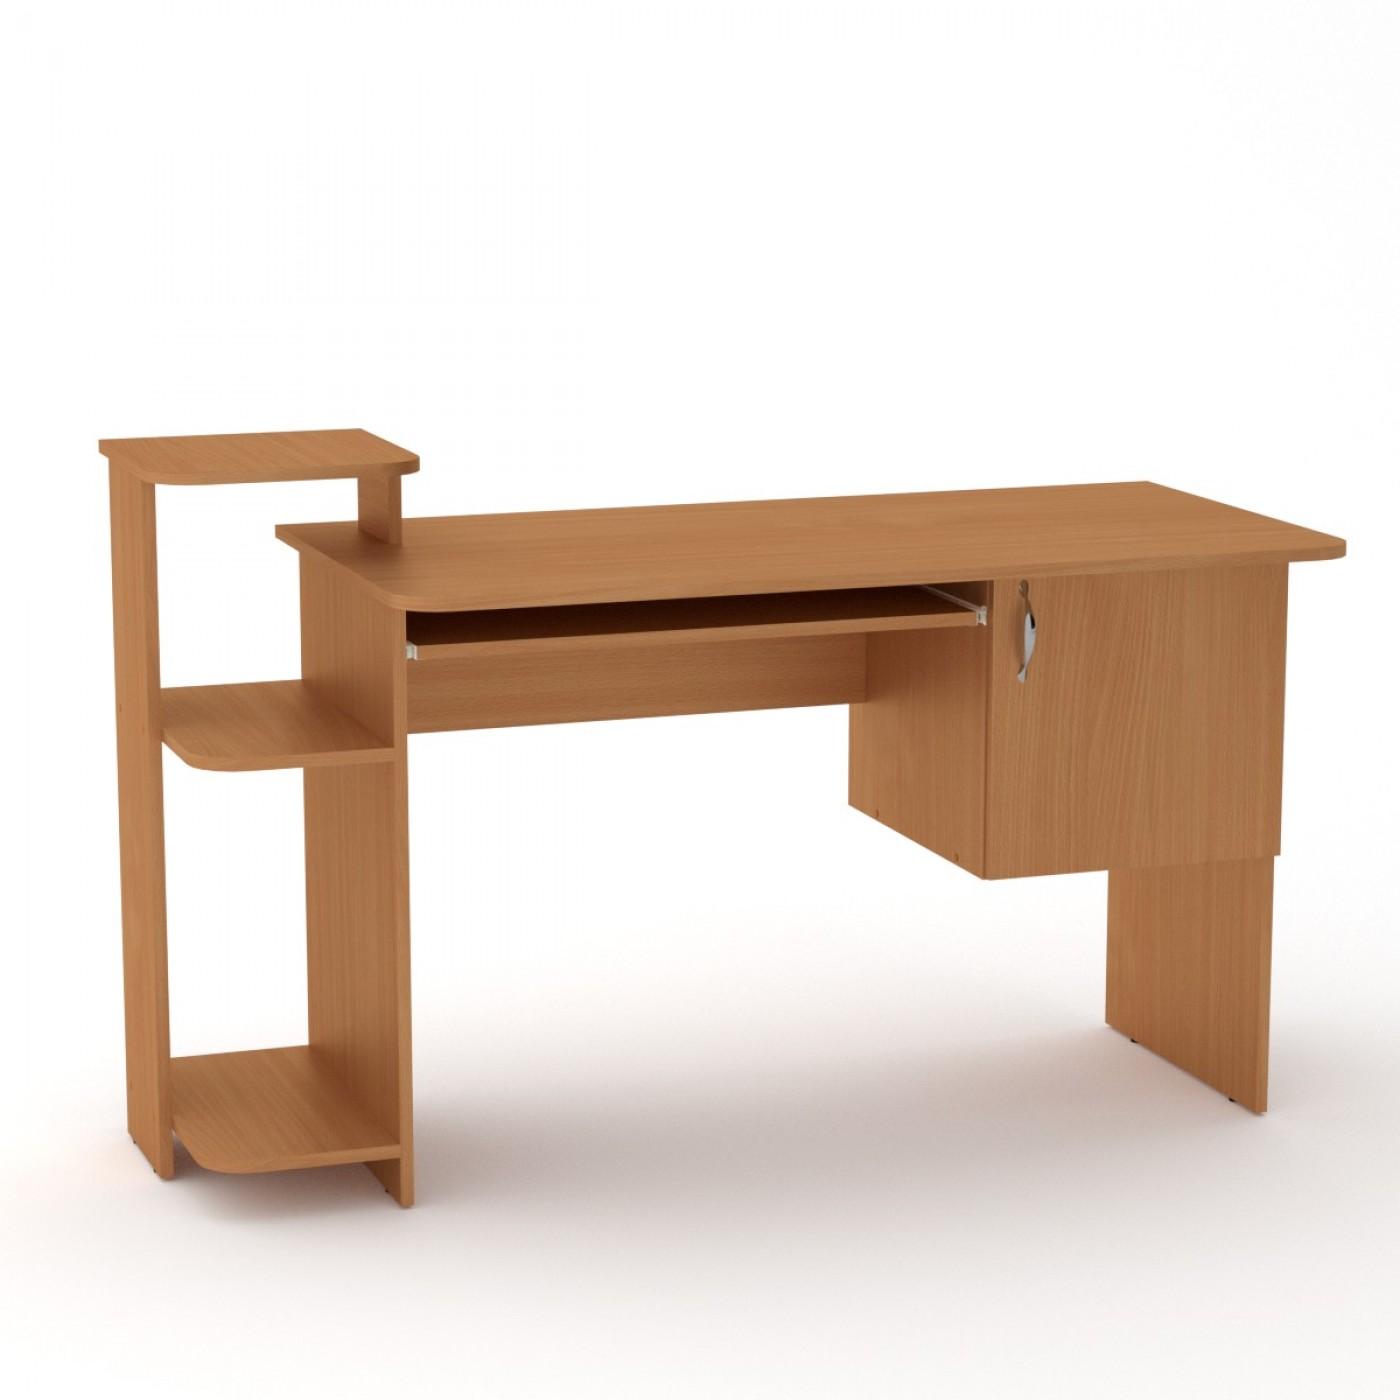 СКМ-3 стол компьютерный